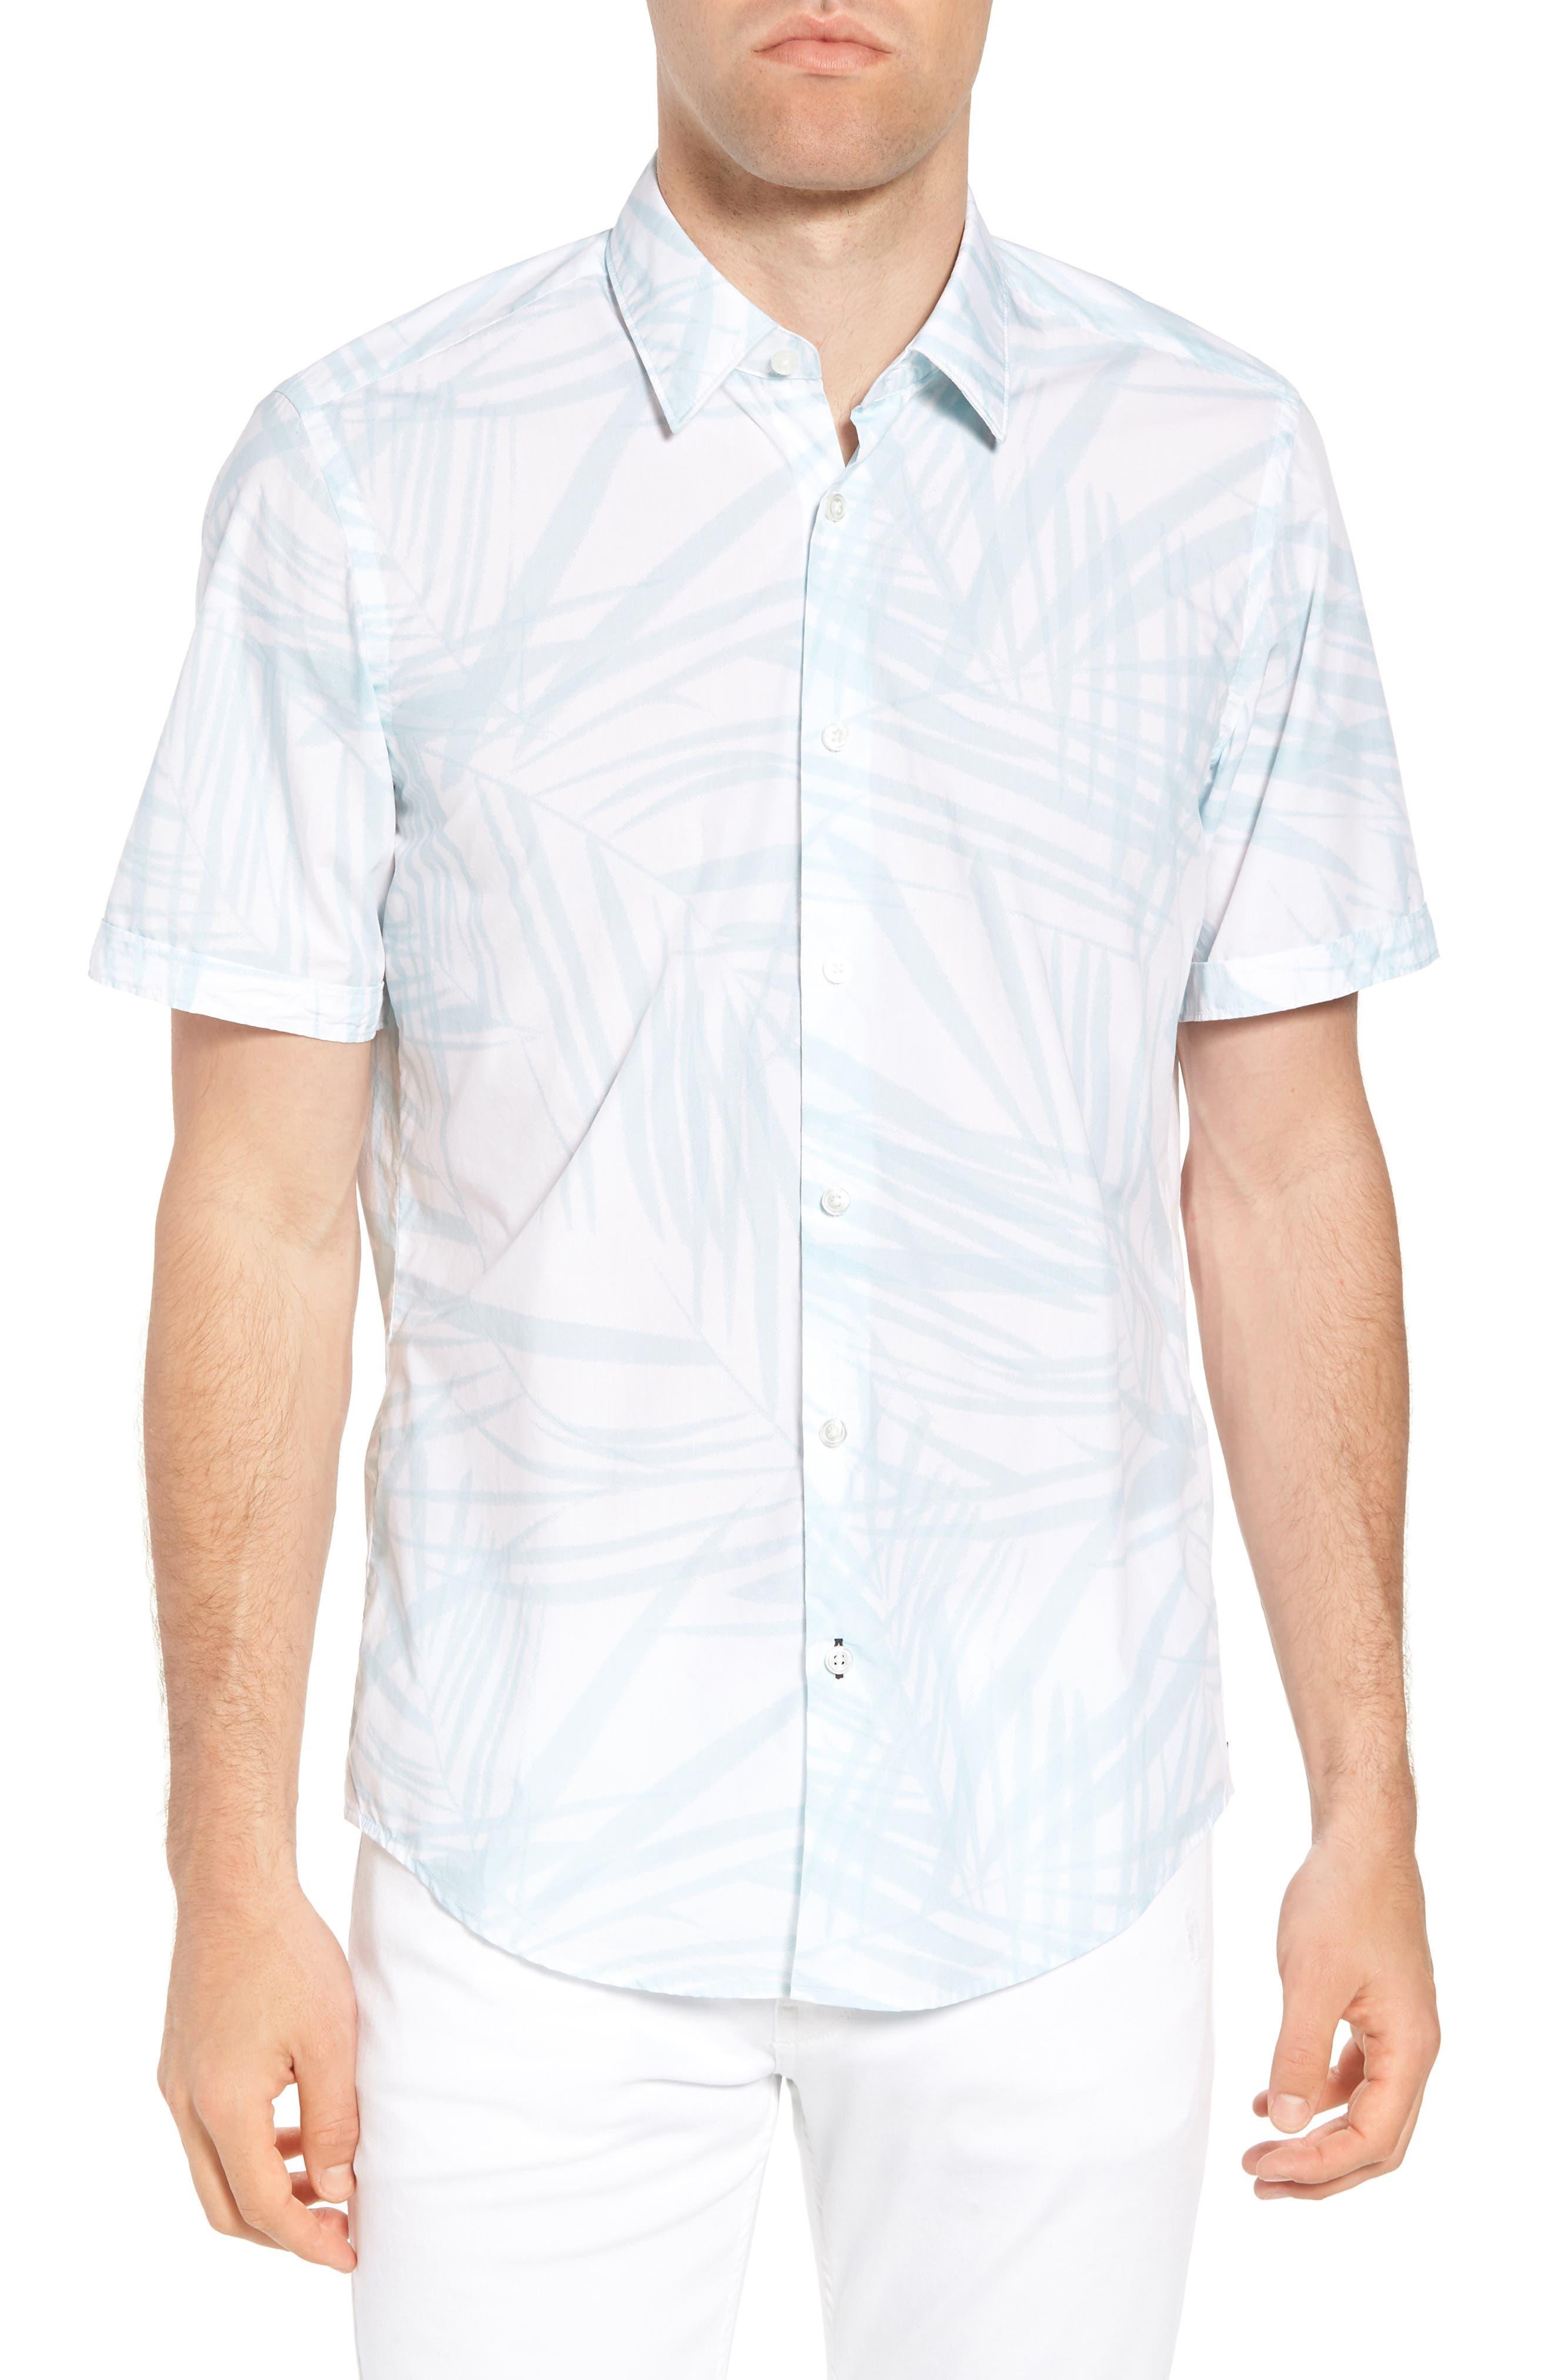 Luka Regular Fit Short Sleeve Sport Shirt,                         Main,                         color, Blue